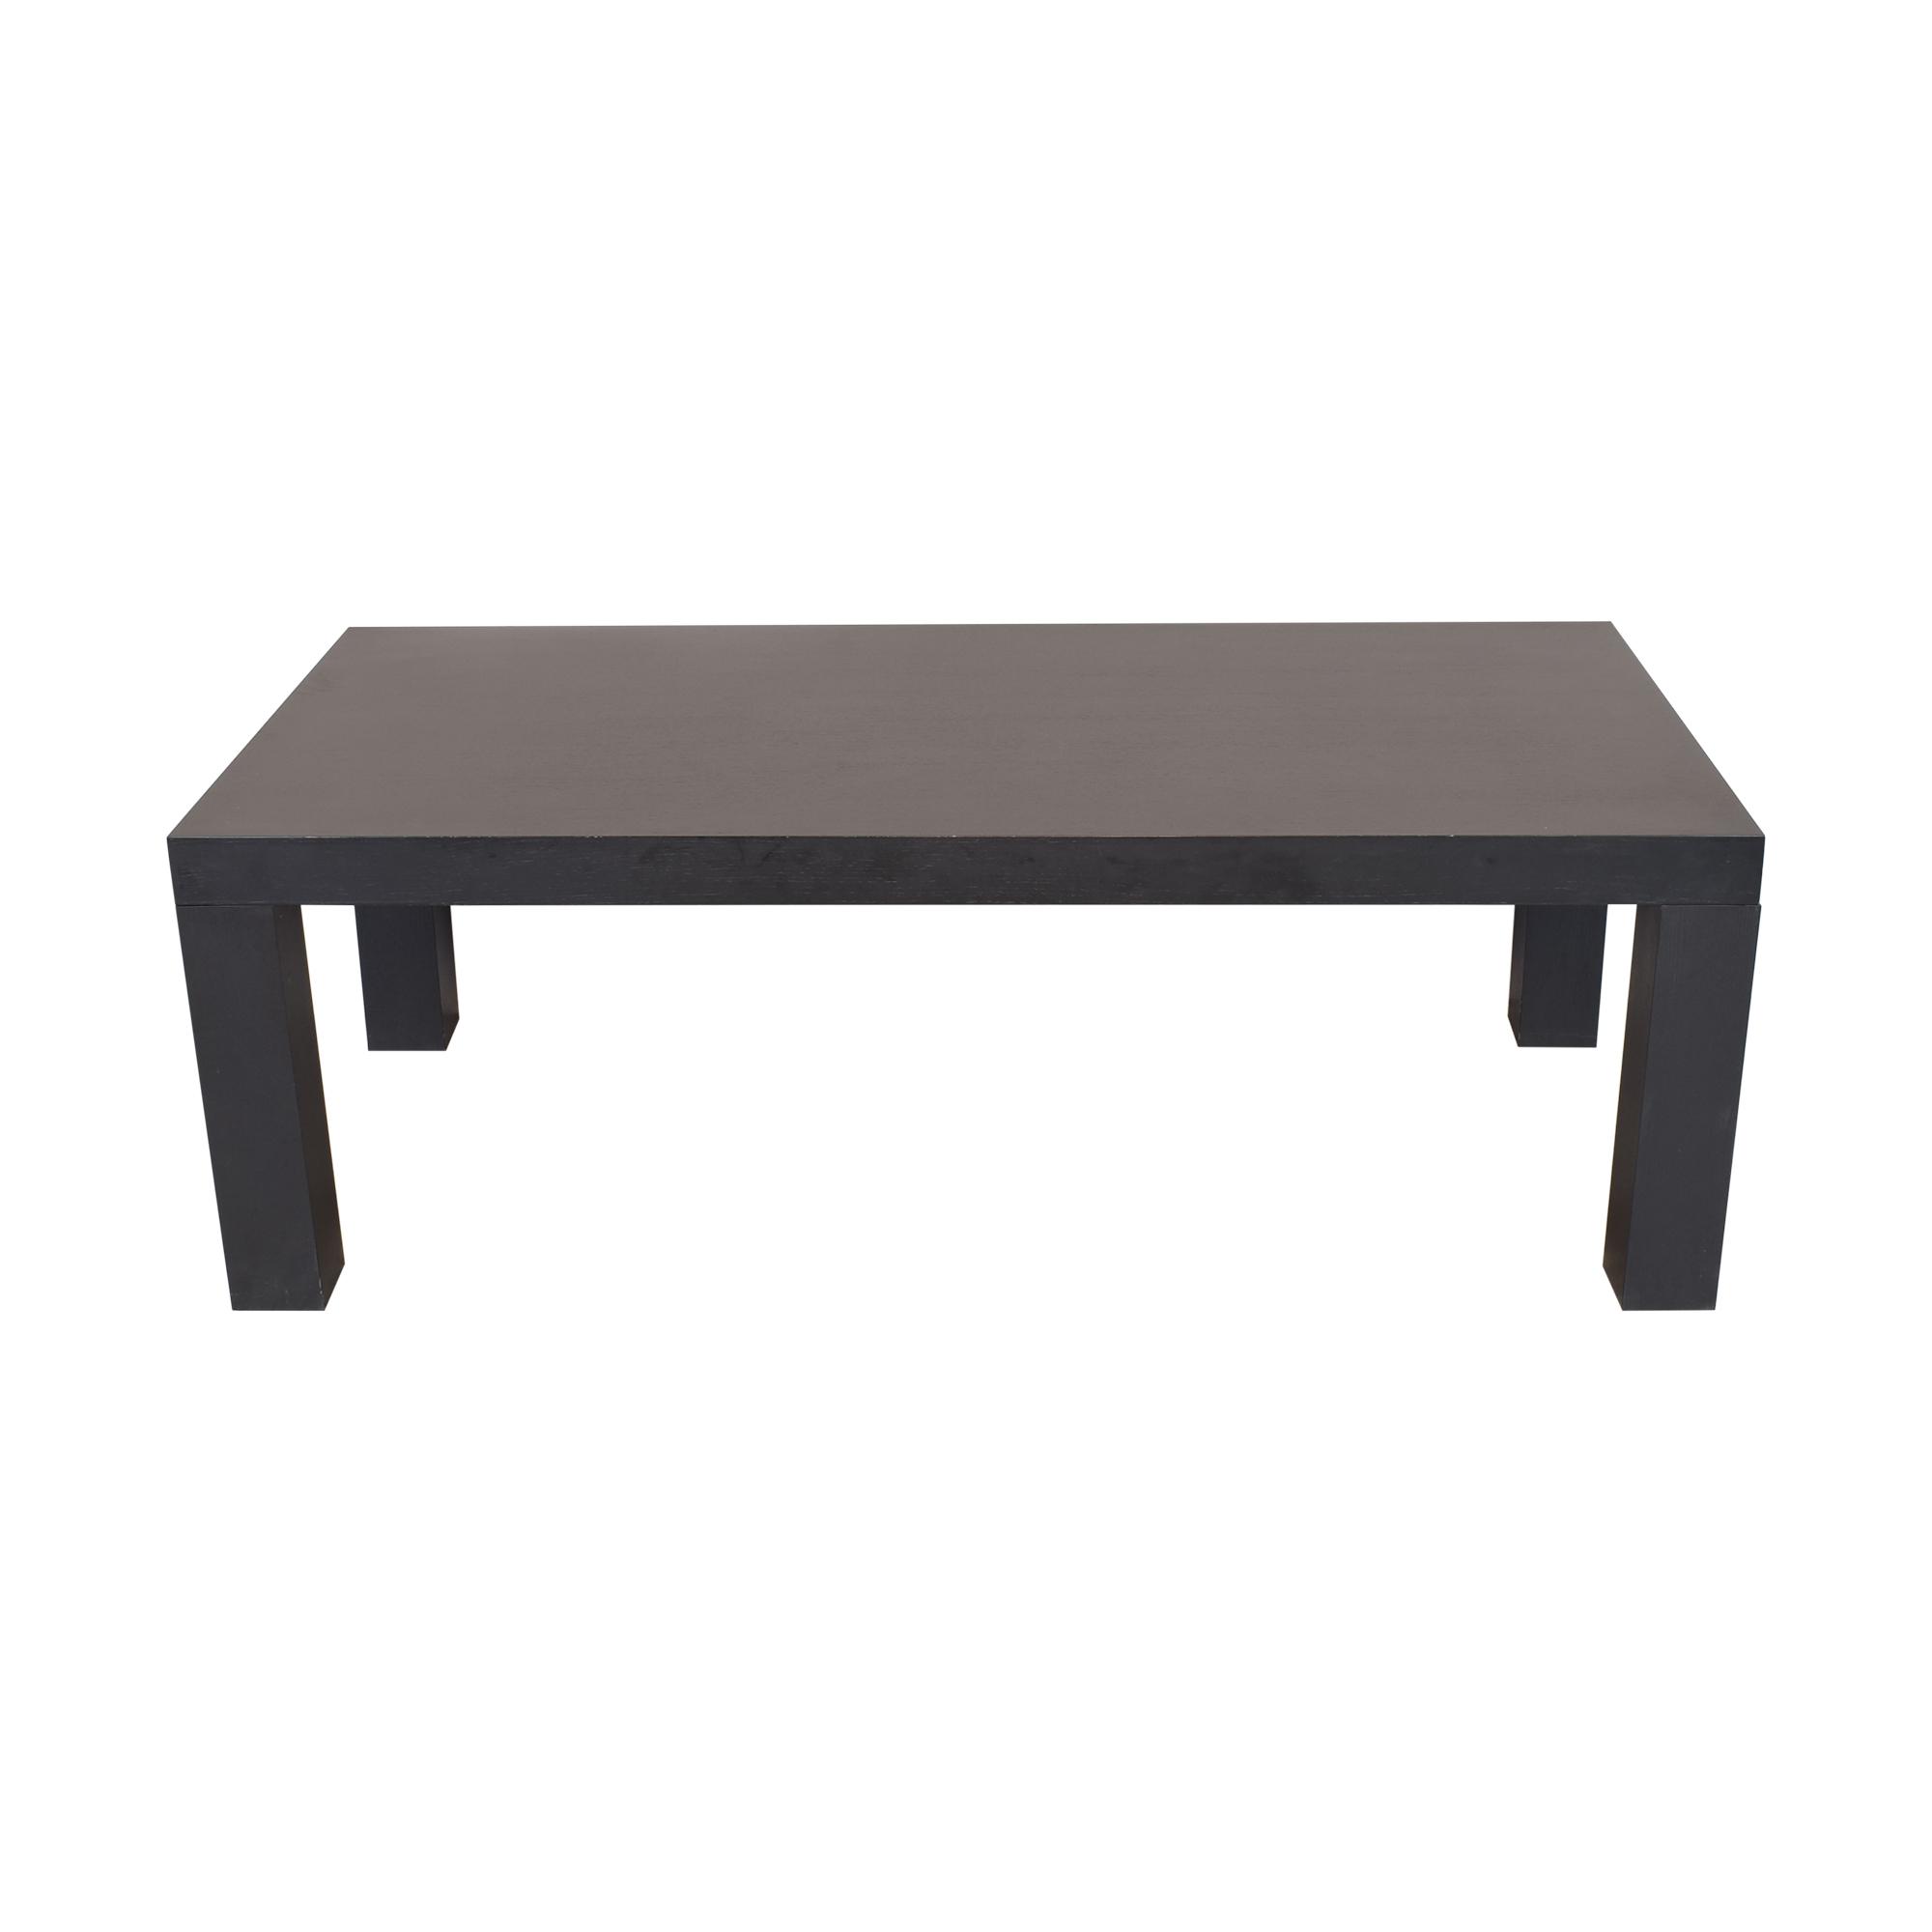 BoConcept BoConcept Rectangular Dining Table on sale